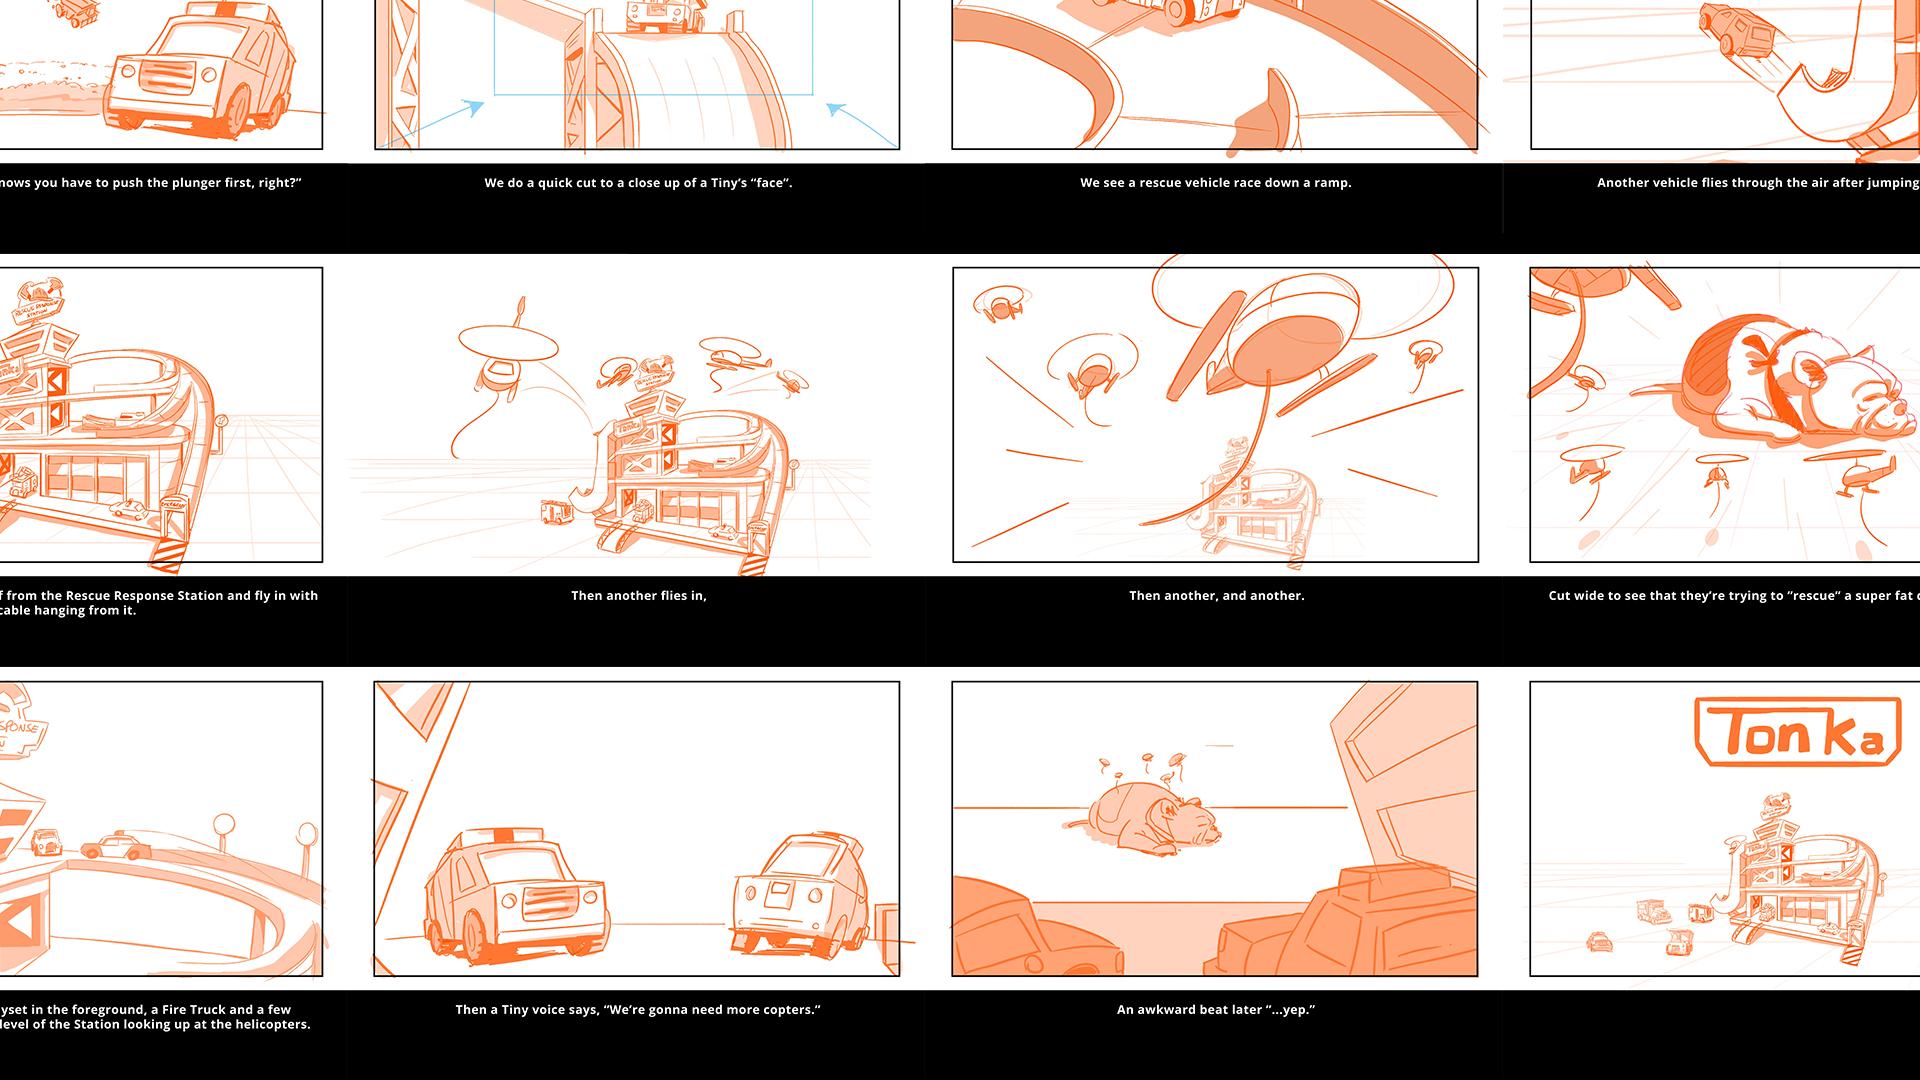 TonkaTinys-Rescue-Storyboard.jpg